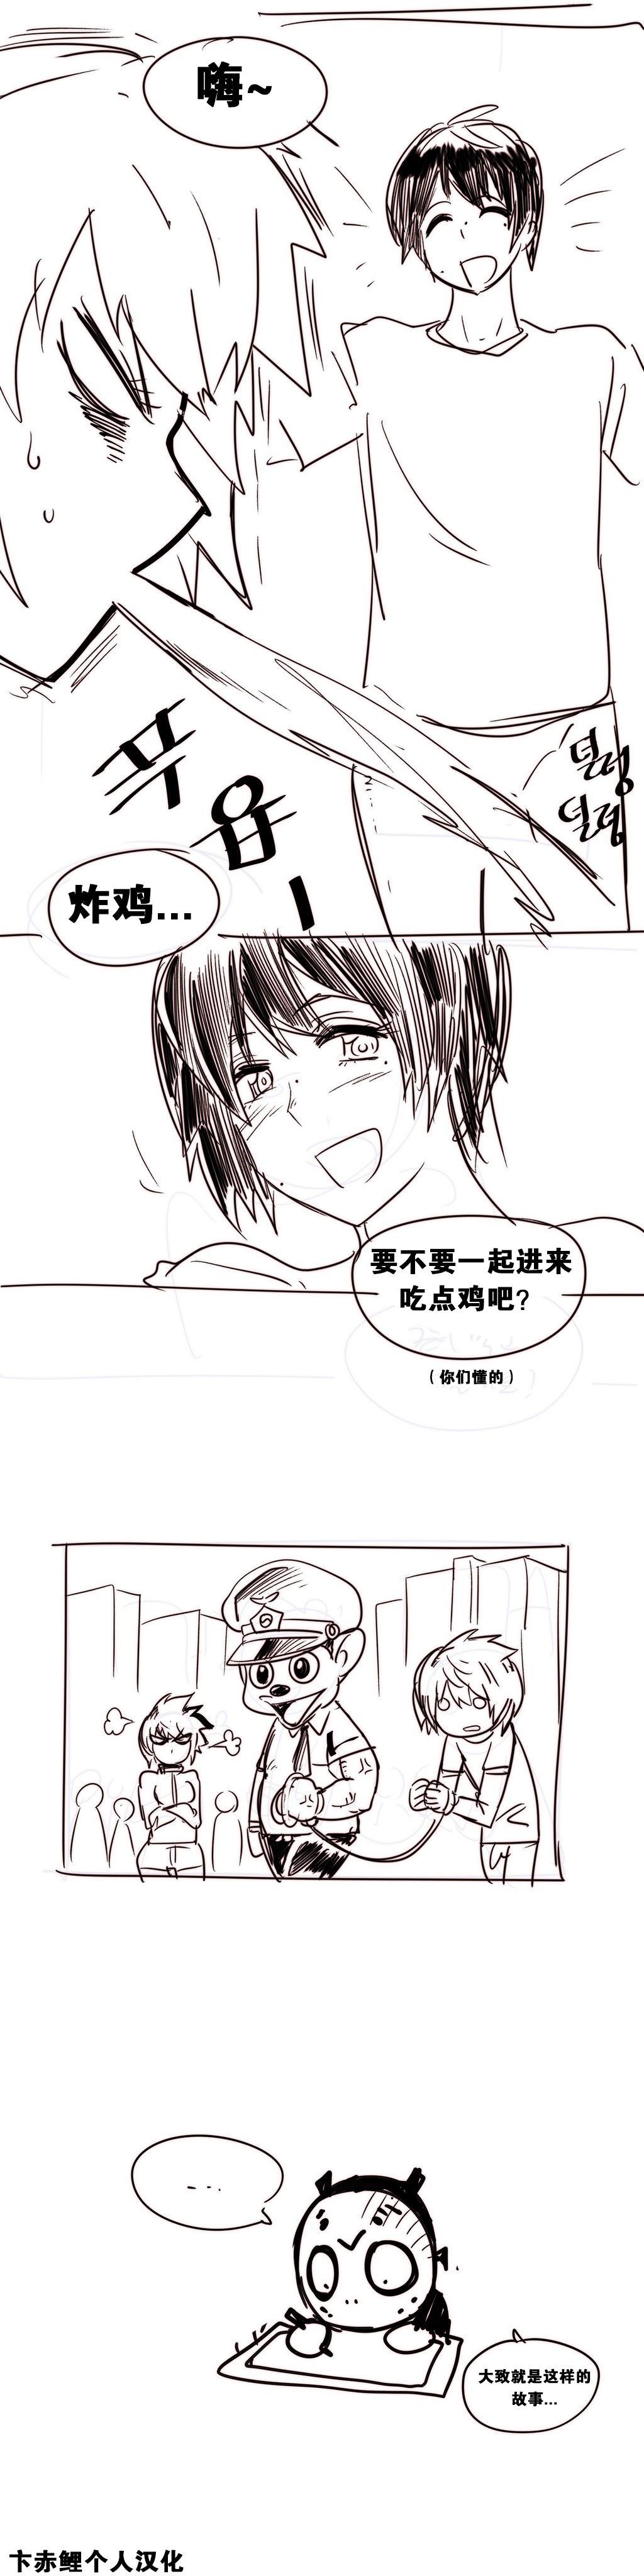 HouseHold Affairs 【卞赤鲤个人汉化】1~21话(持续更新中) 281